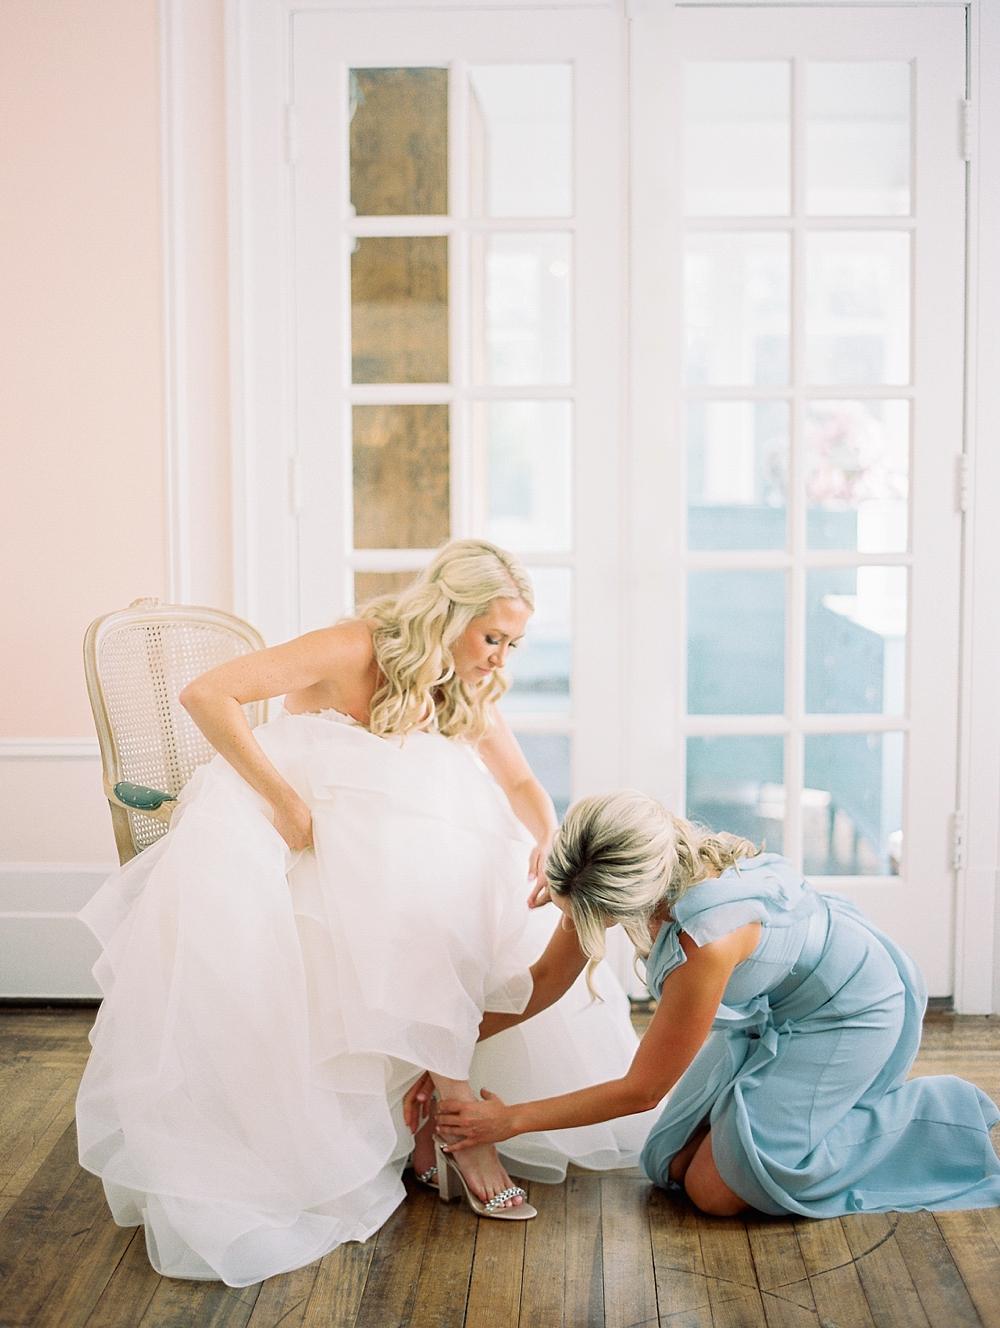 kristin-la-voie-photography-lehmann-mansion-wedding-photographer-73